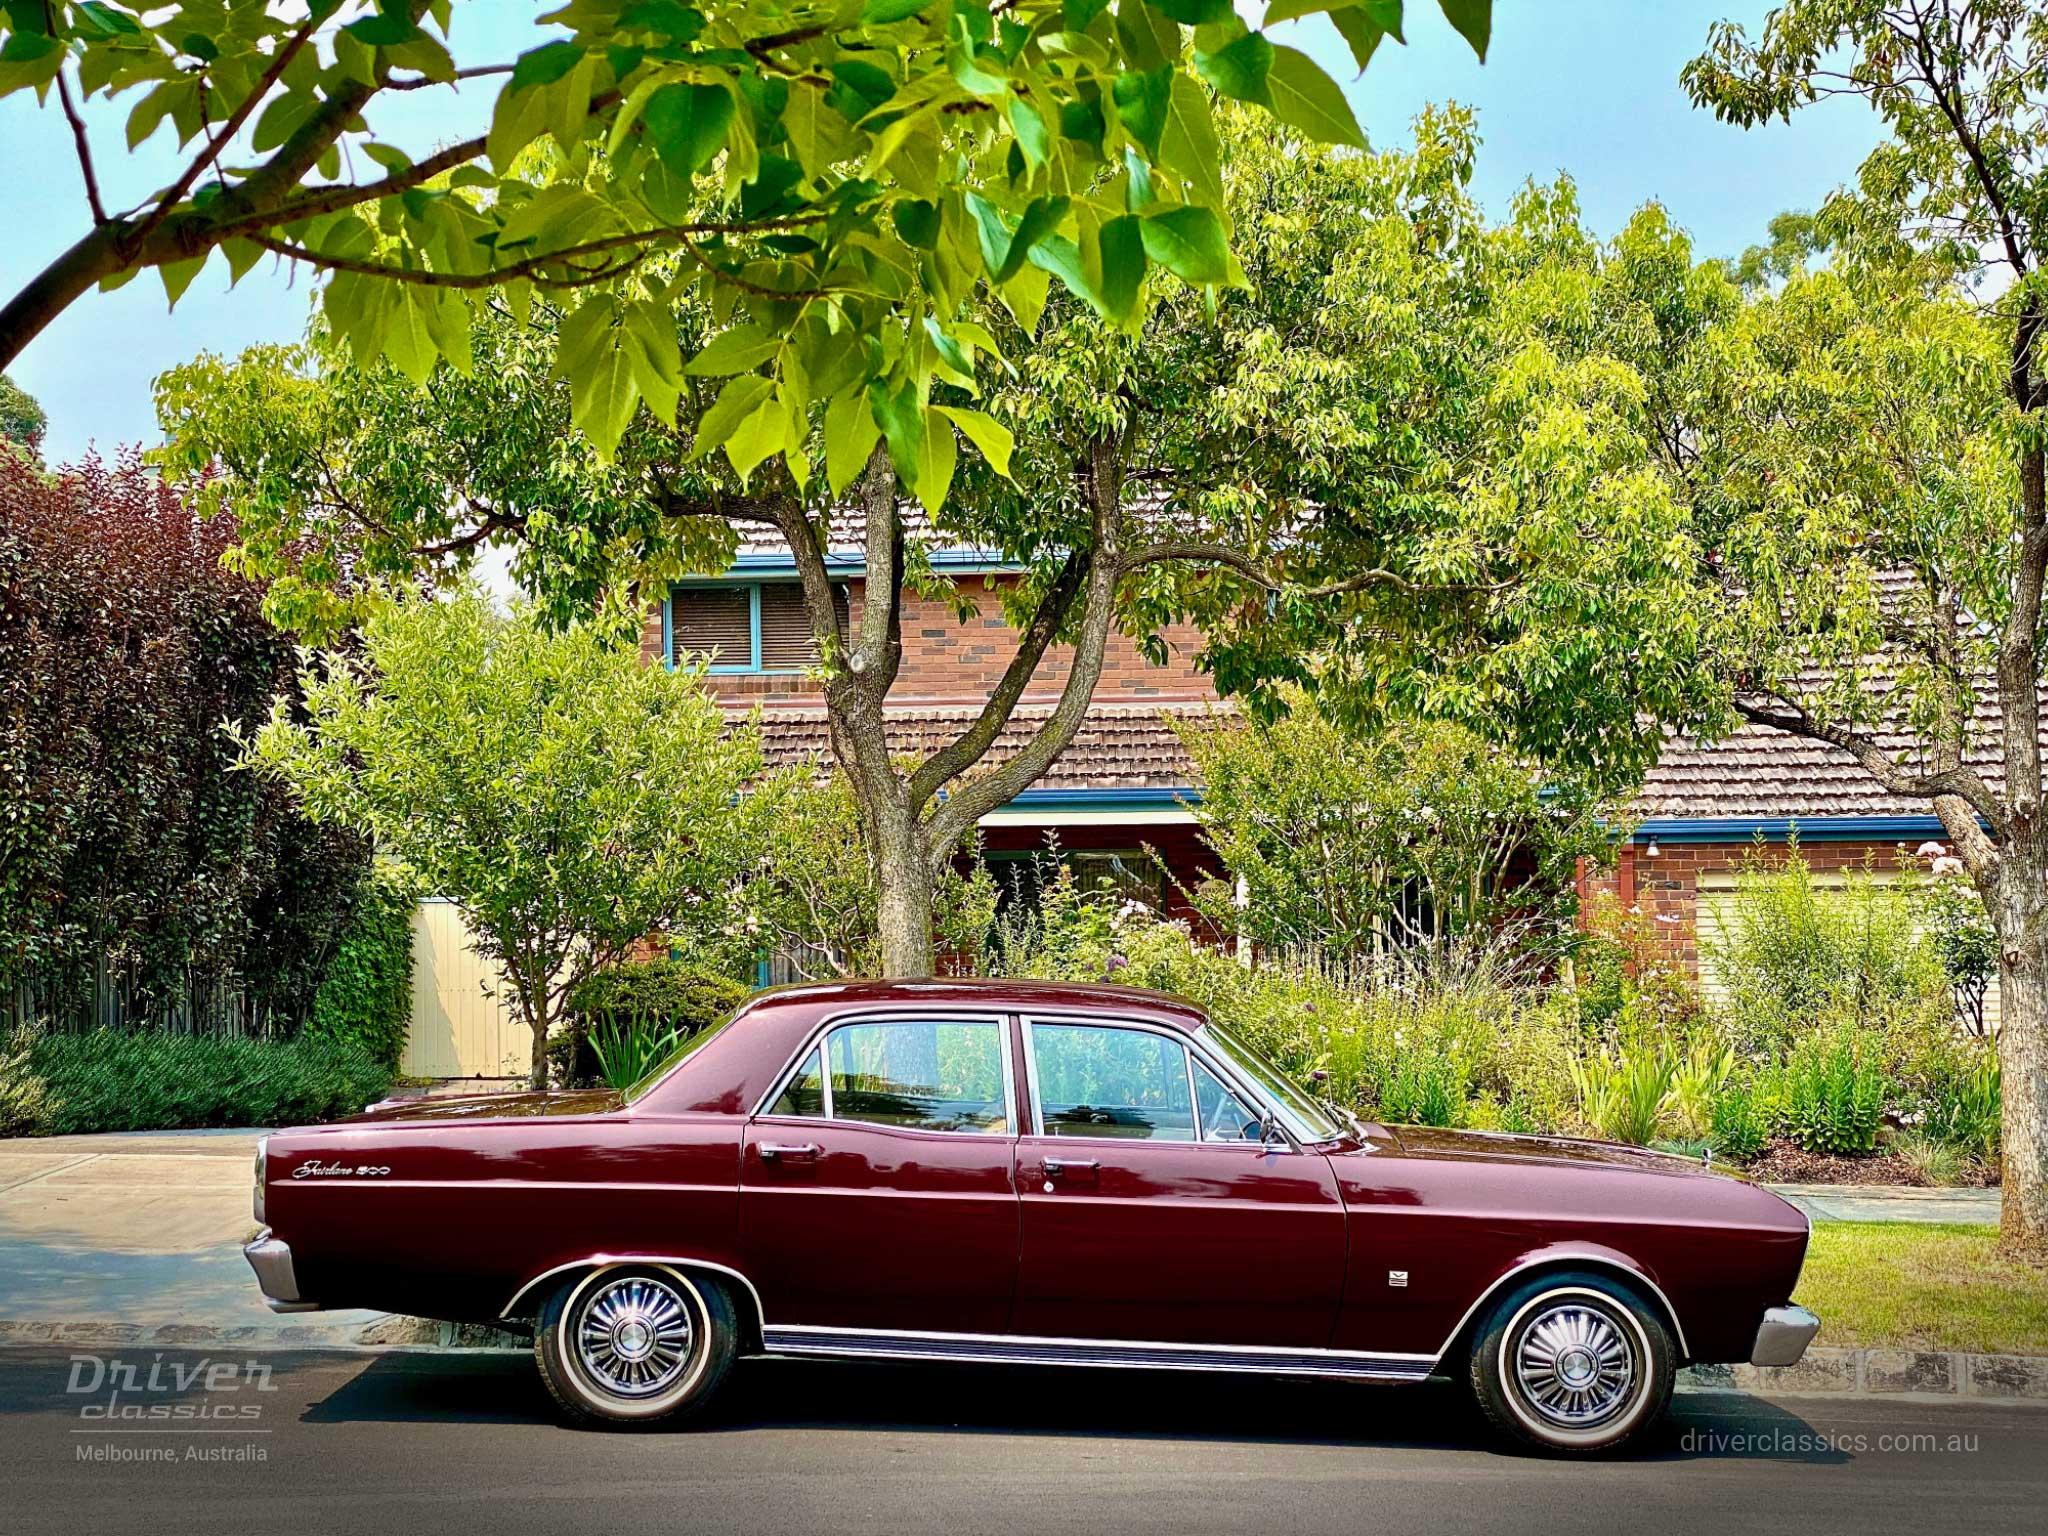 Ford Fairlane 500, 1968 version, Side profile, Glen Iris VIC, Photo taken January 2020